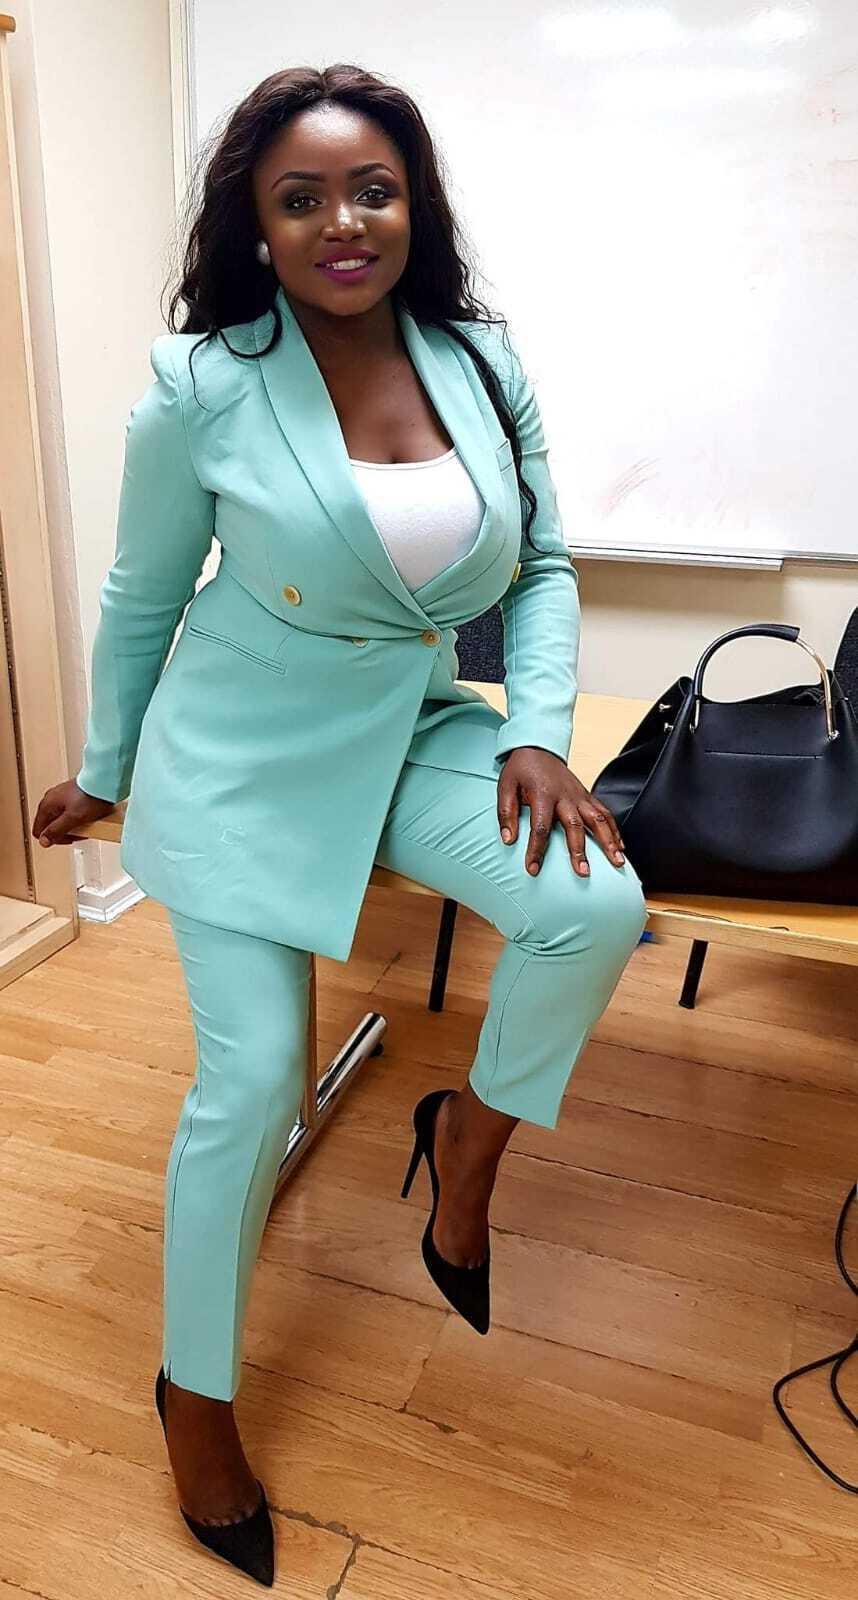 Cameroonian Matchmaker Delphine Singah PhilipS